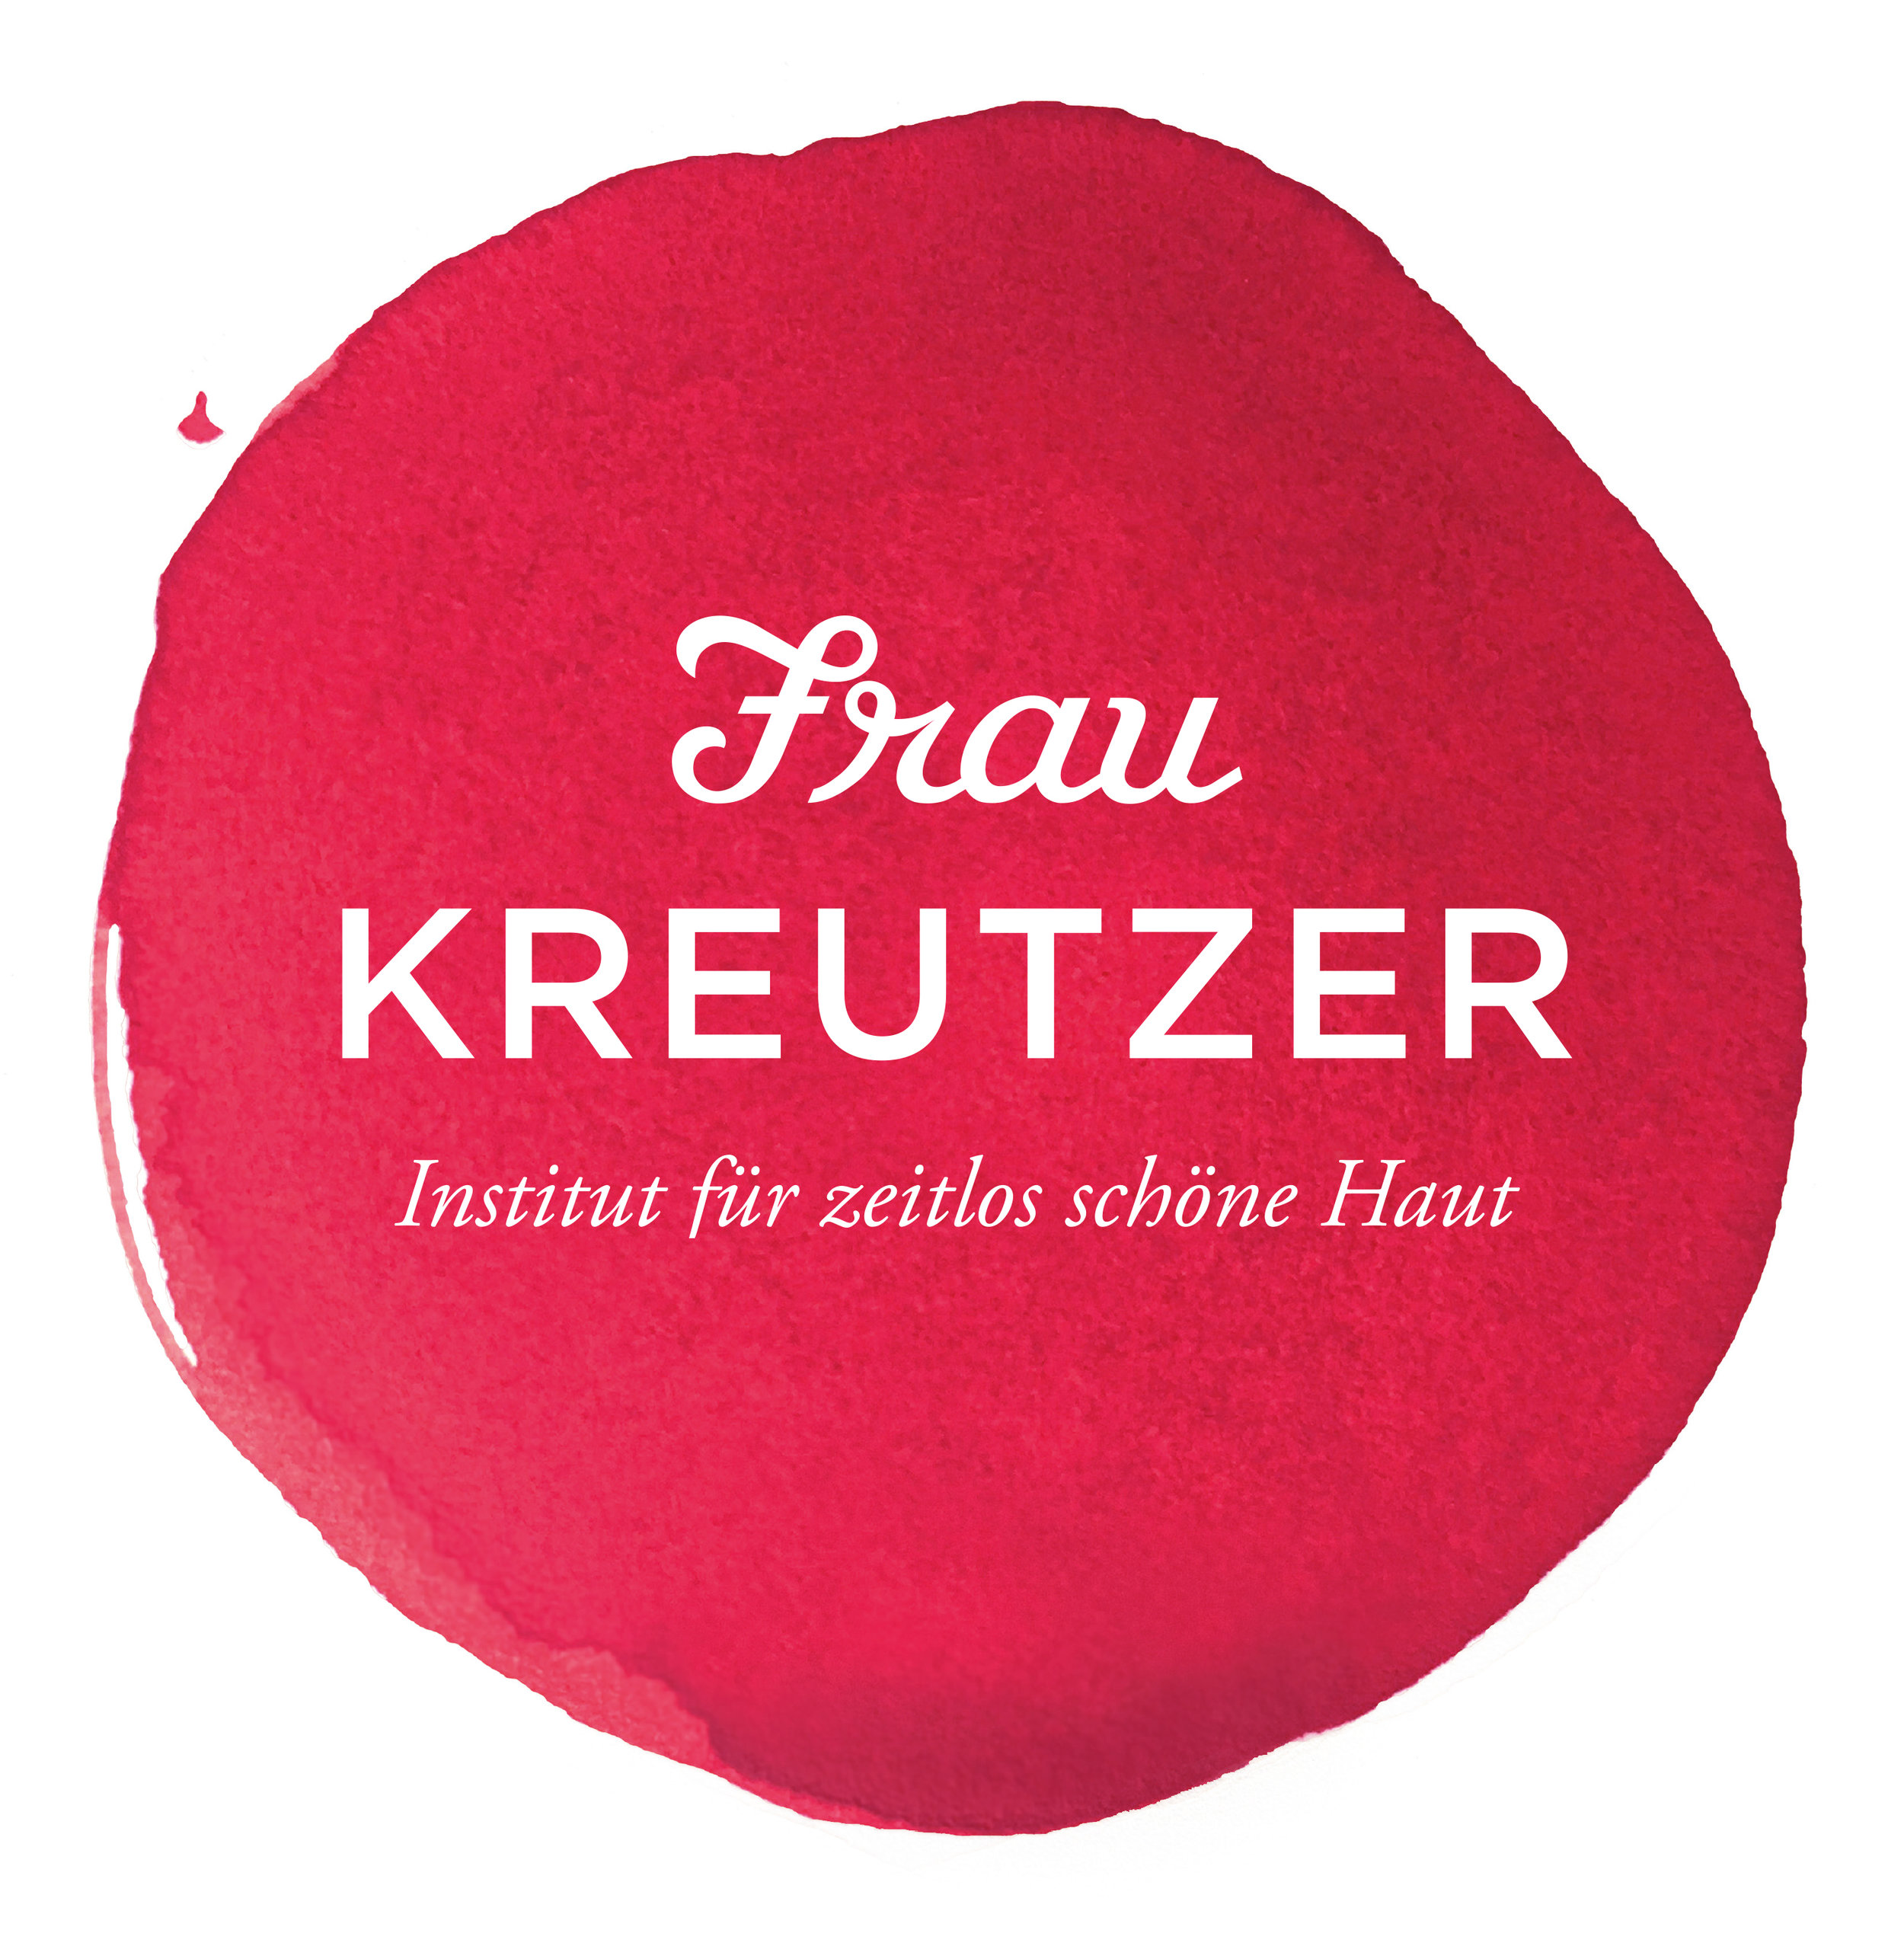 Frau Kreutzer_Kosmetik_Hautspezialistin_göppingen_stuttgart.jpg